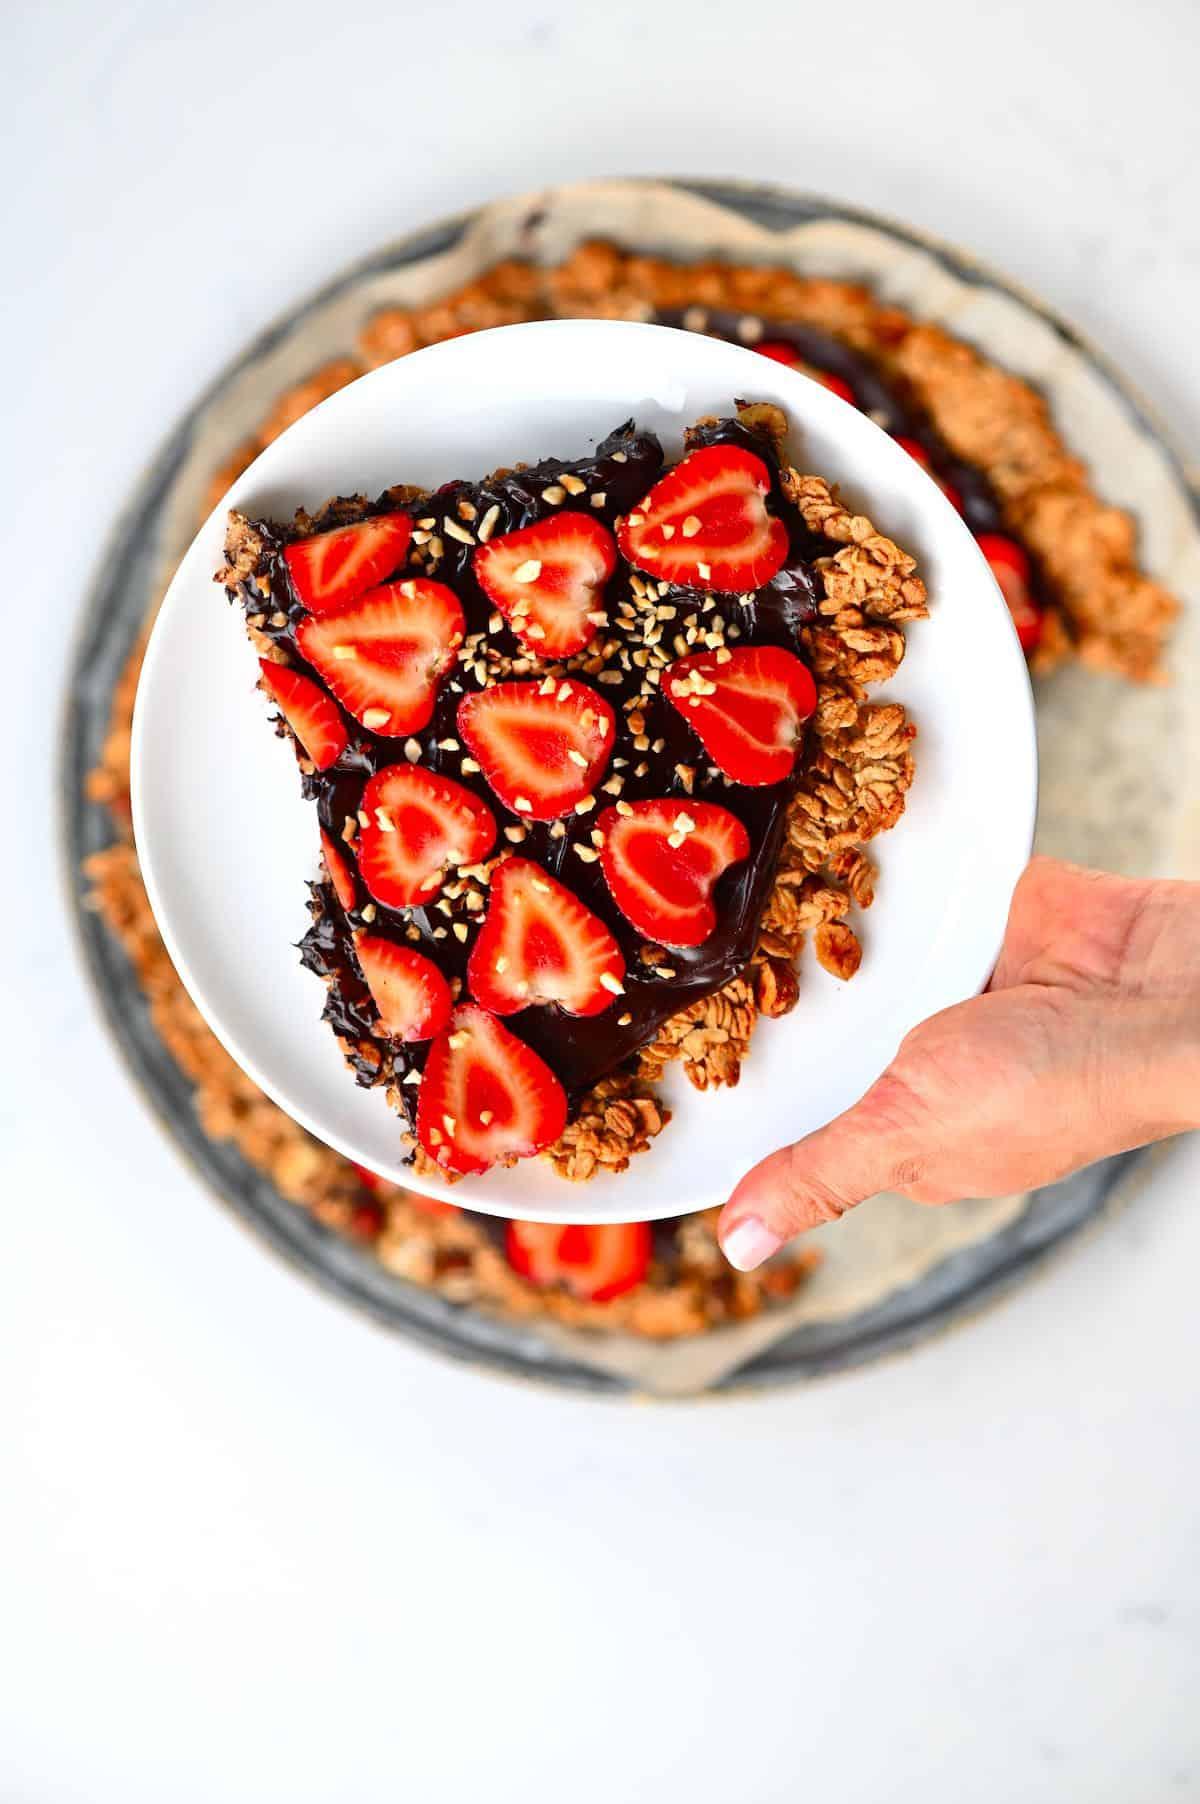 Strawberry Nutella Pizza slice on a white plate